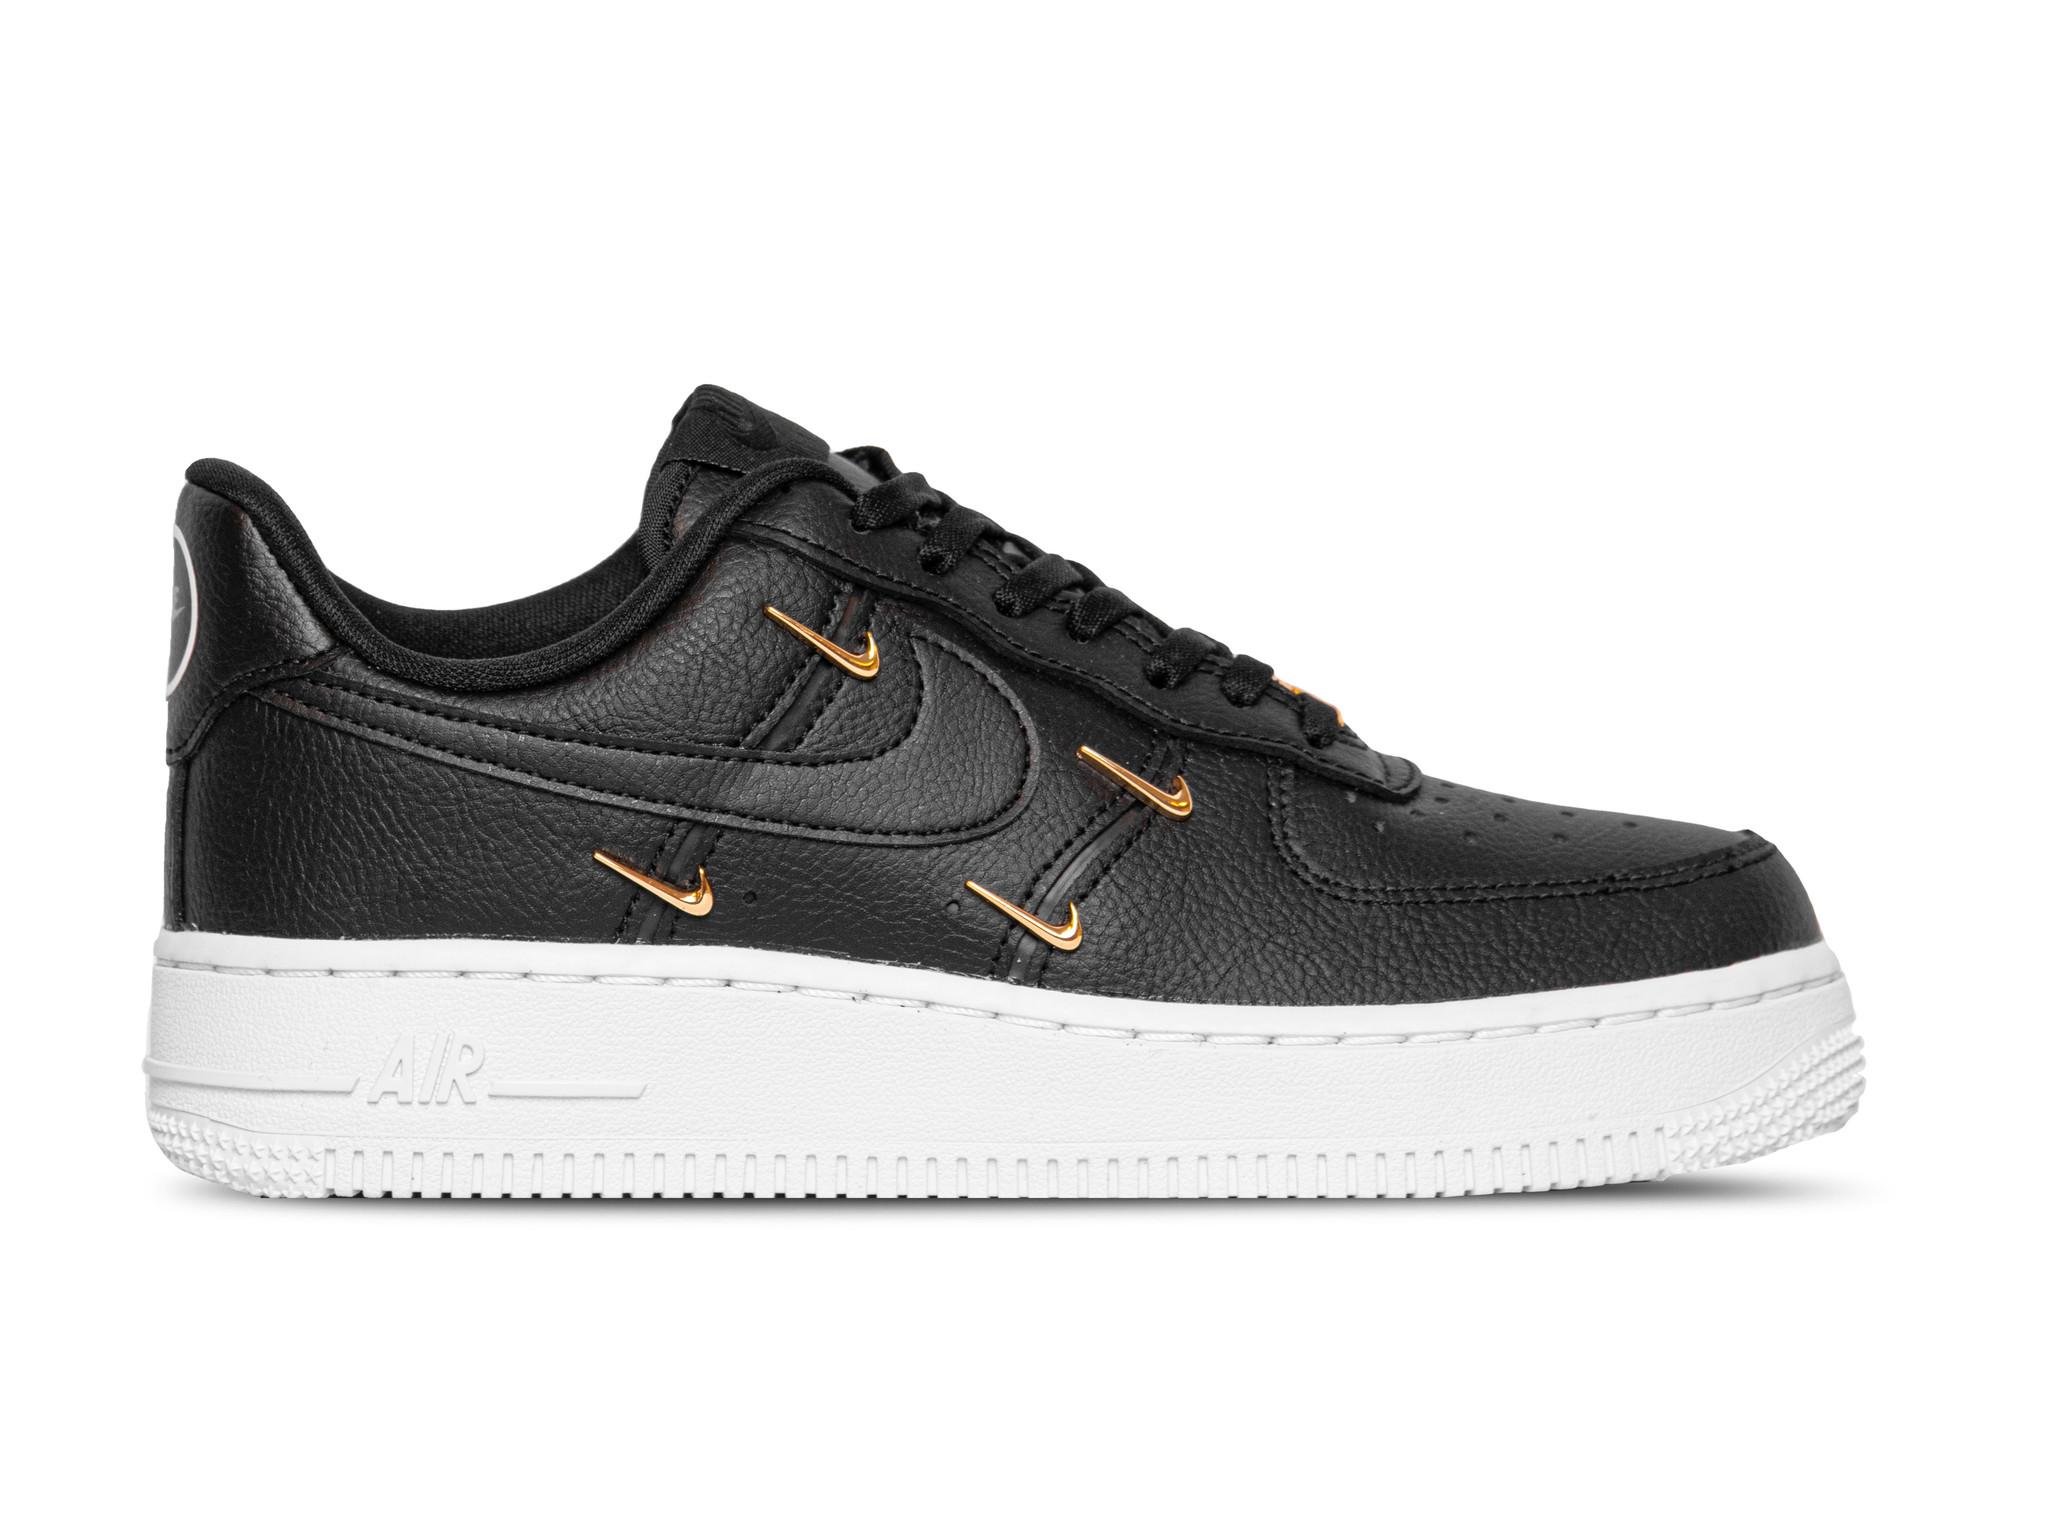 Nike Air Force 1 07 LX Black Metallic Gold Hyper Royal CT1990 001